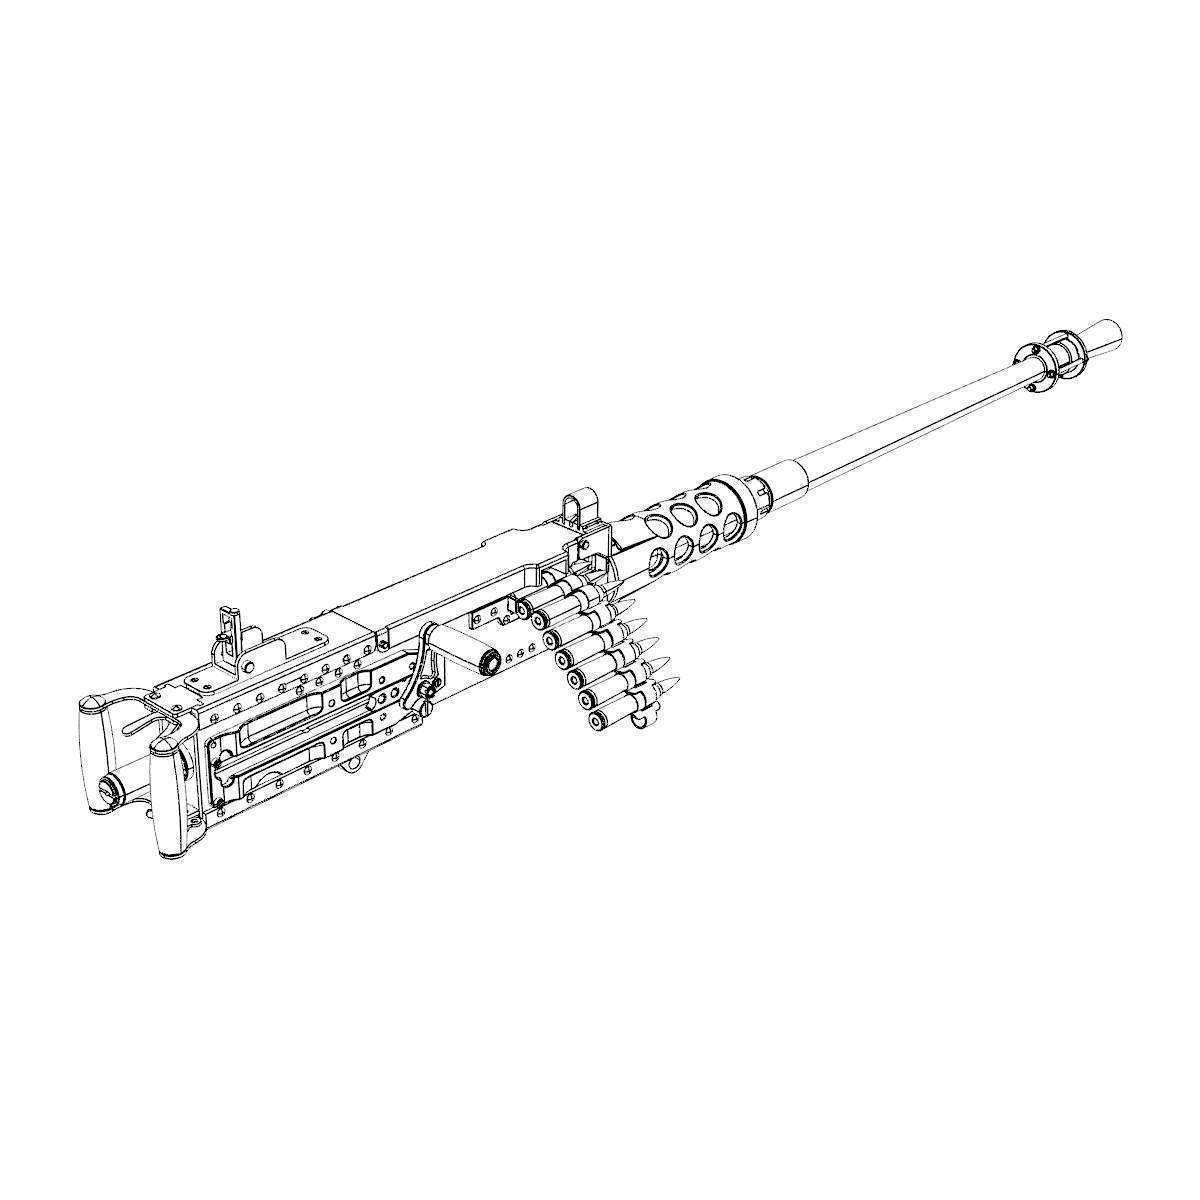 Browning Machine Gun Cal 50 M2hb Flexible 3d Model X